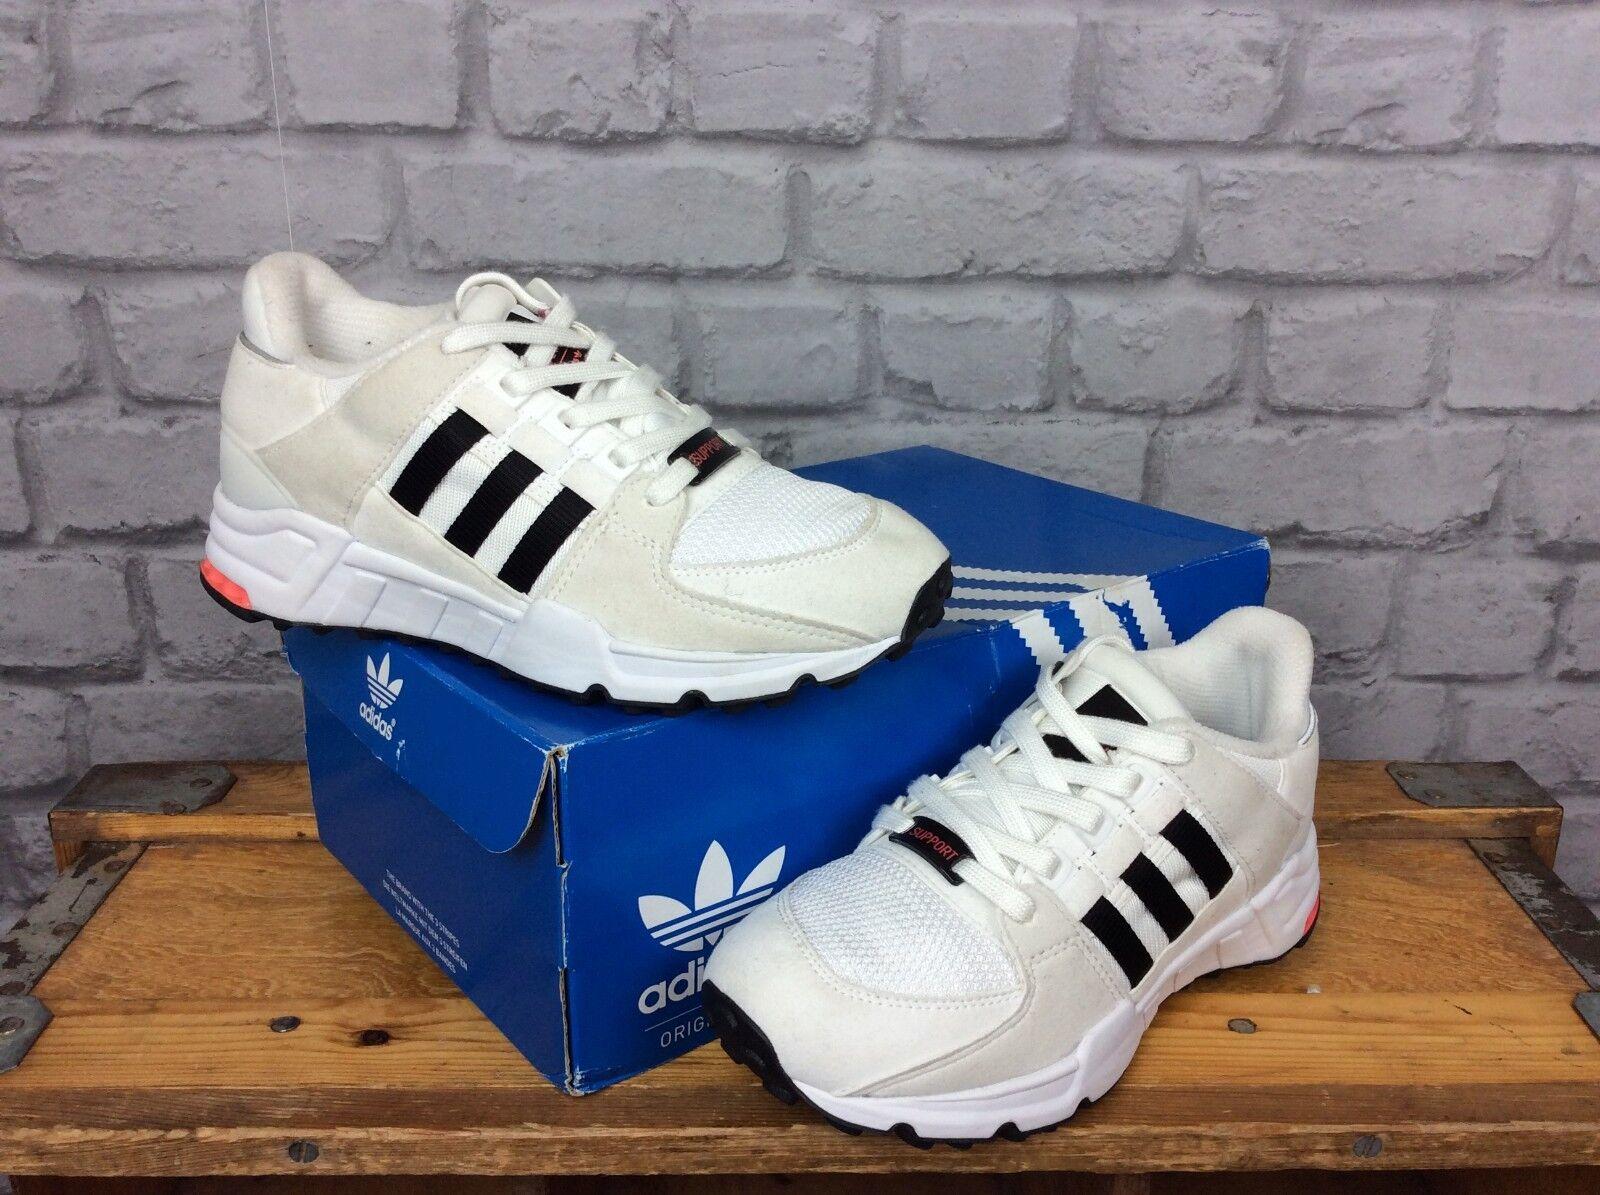 Adidas Femmes UK 3 EU Rose 35 1/2 Équipement Noir Blanc Rose EU Torsion Baskets 2fc437